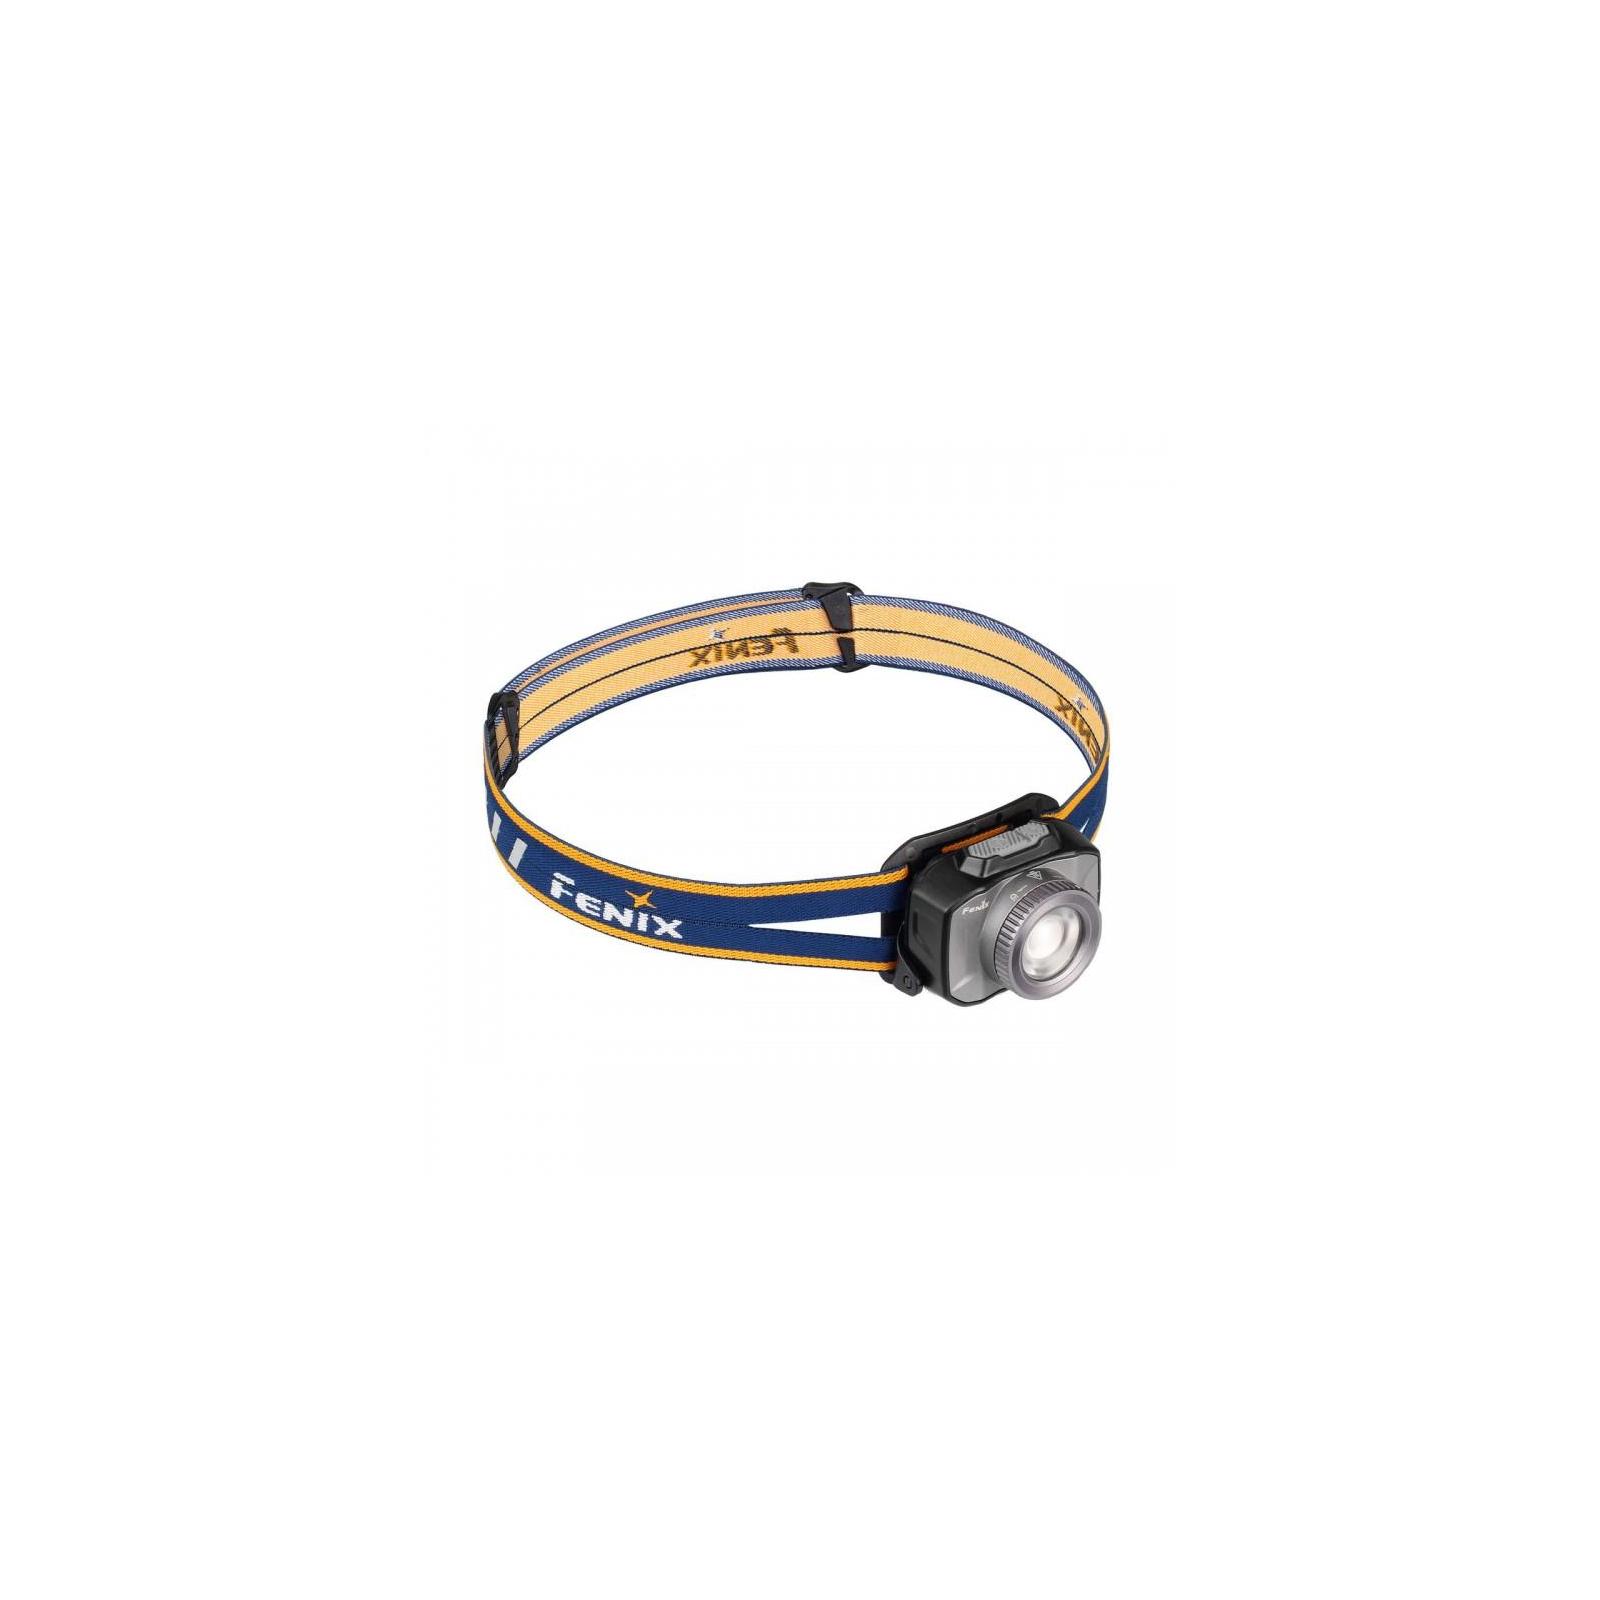 Фонарь Fenix HL40R Cree XP-LHIV2 LED серый (HL40RGY) изображение 2